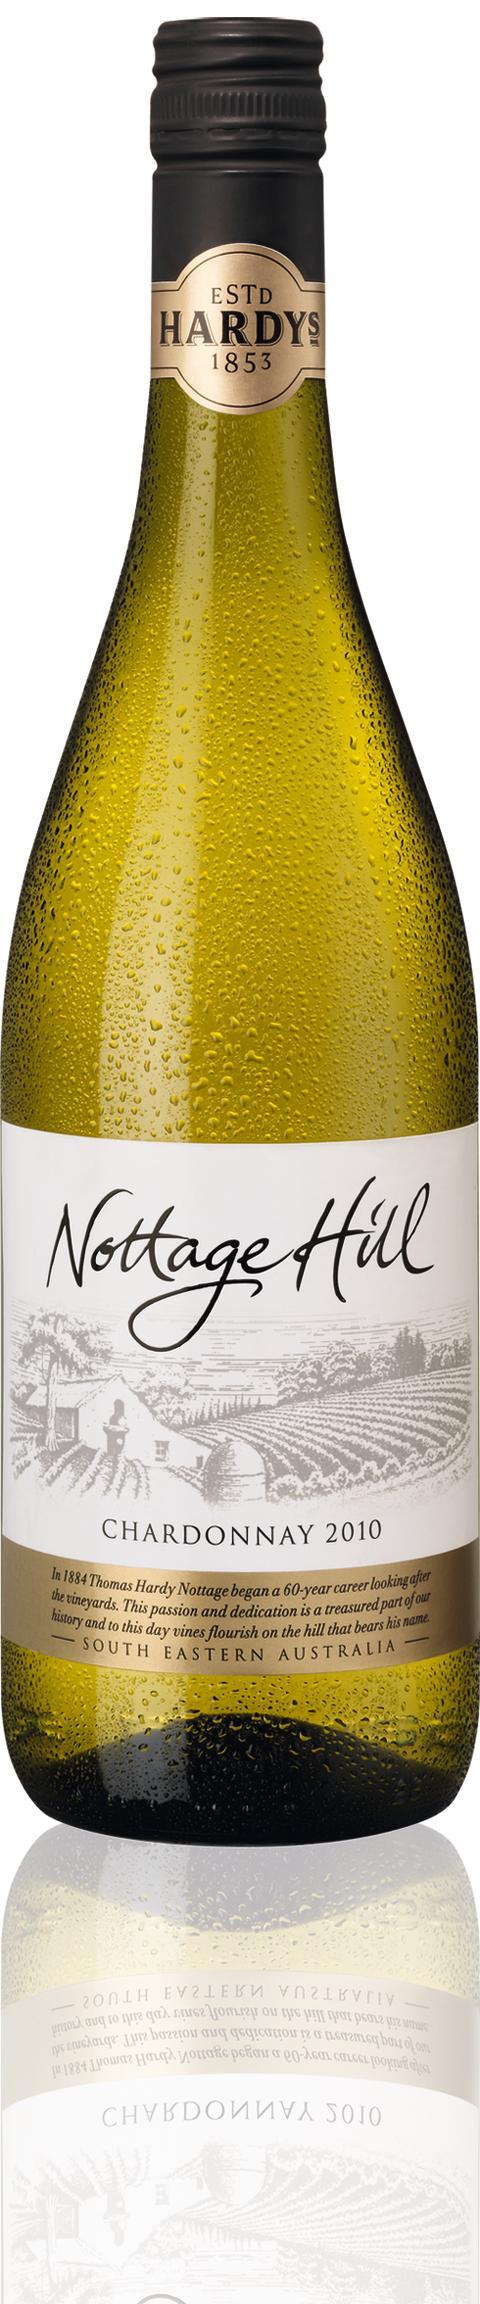 Nottage Hill Chardonnay